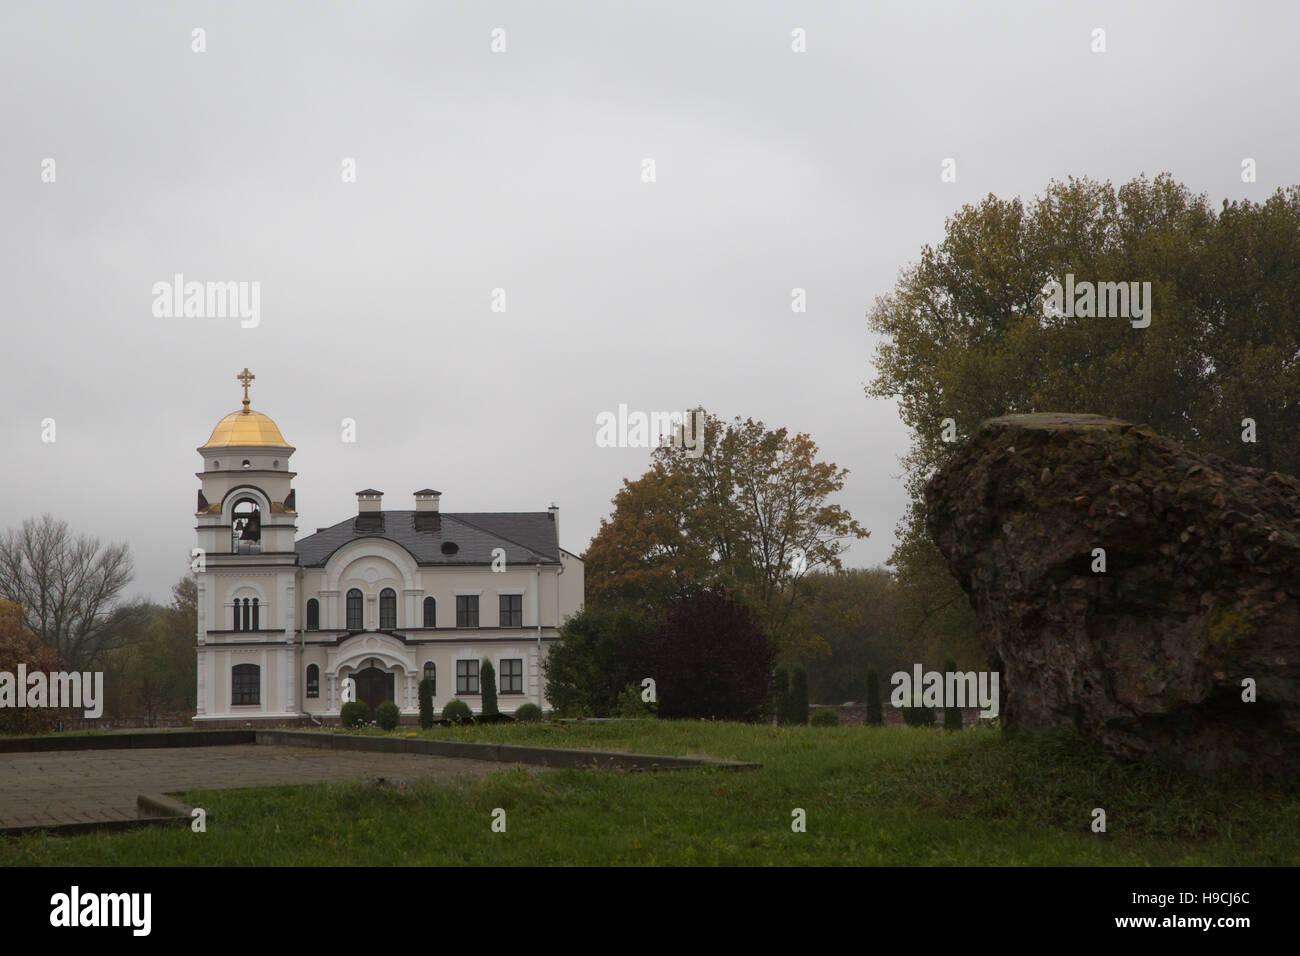 Brest Fortress. Memorial to fallen heroes. - Stock Image